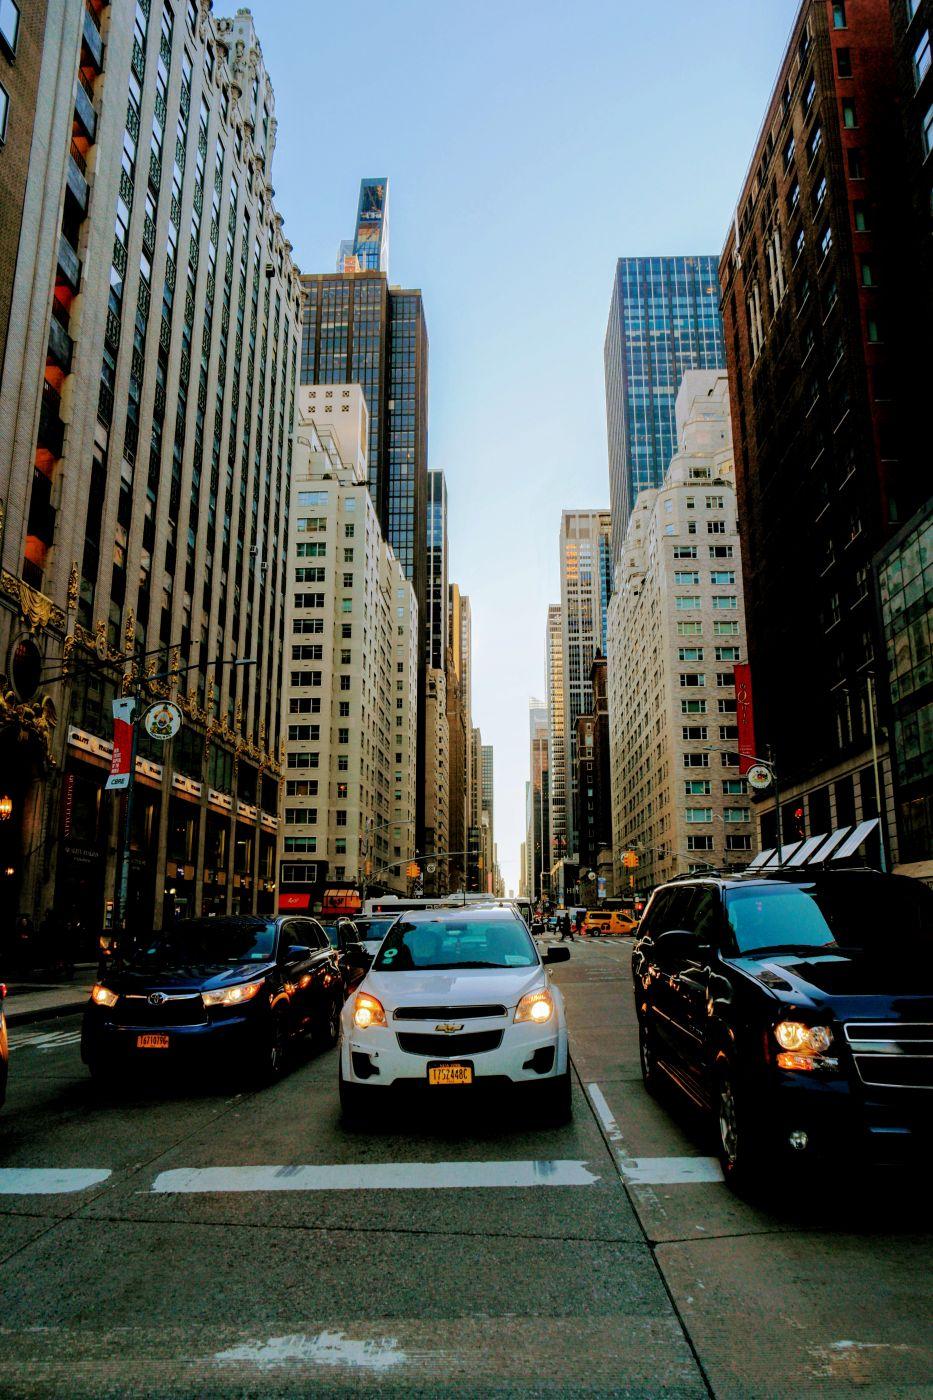 NYC 6th Avenue 58th street, USA